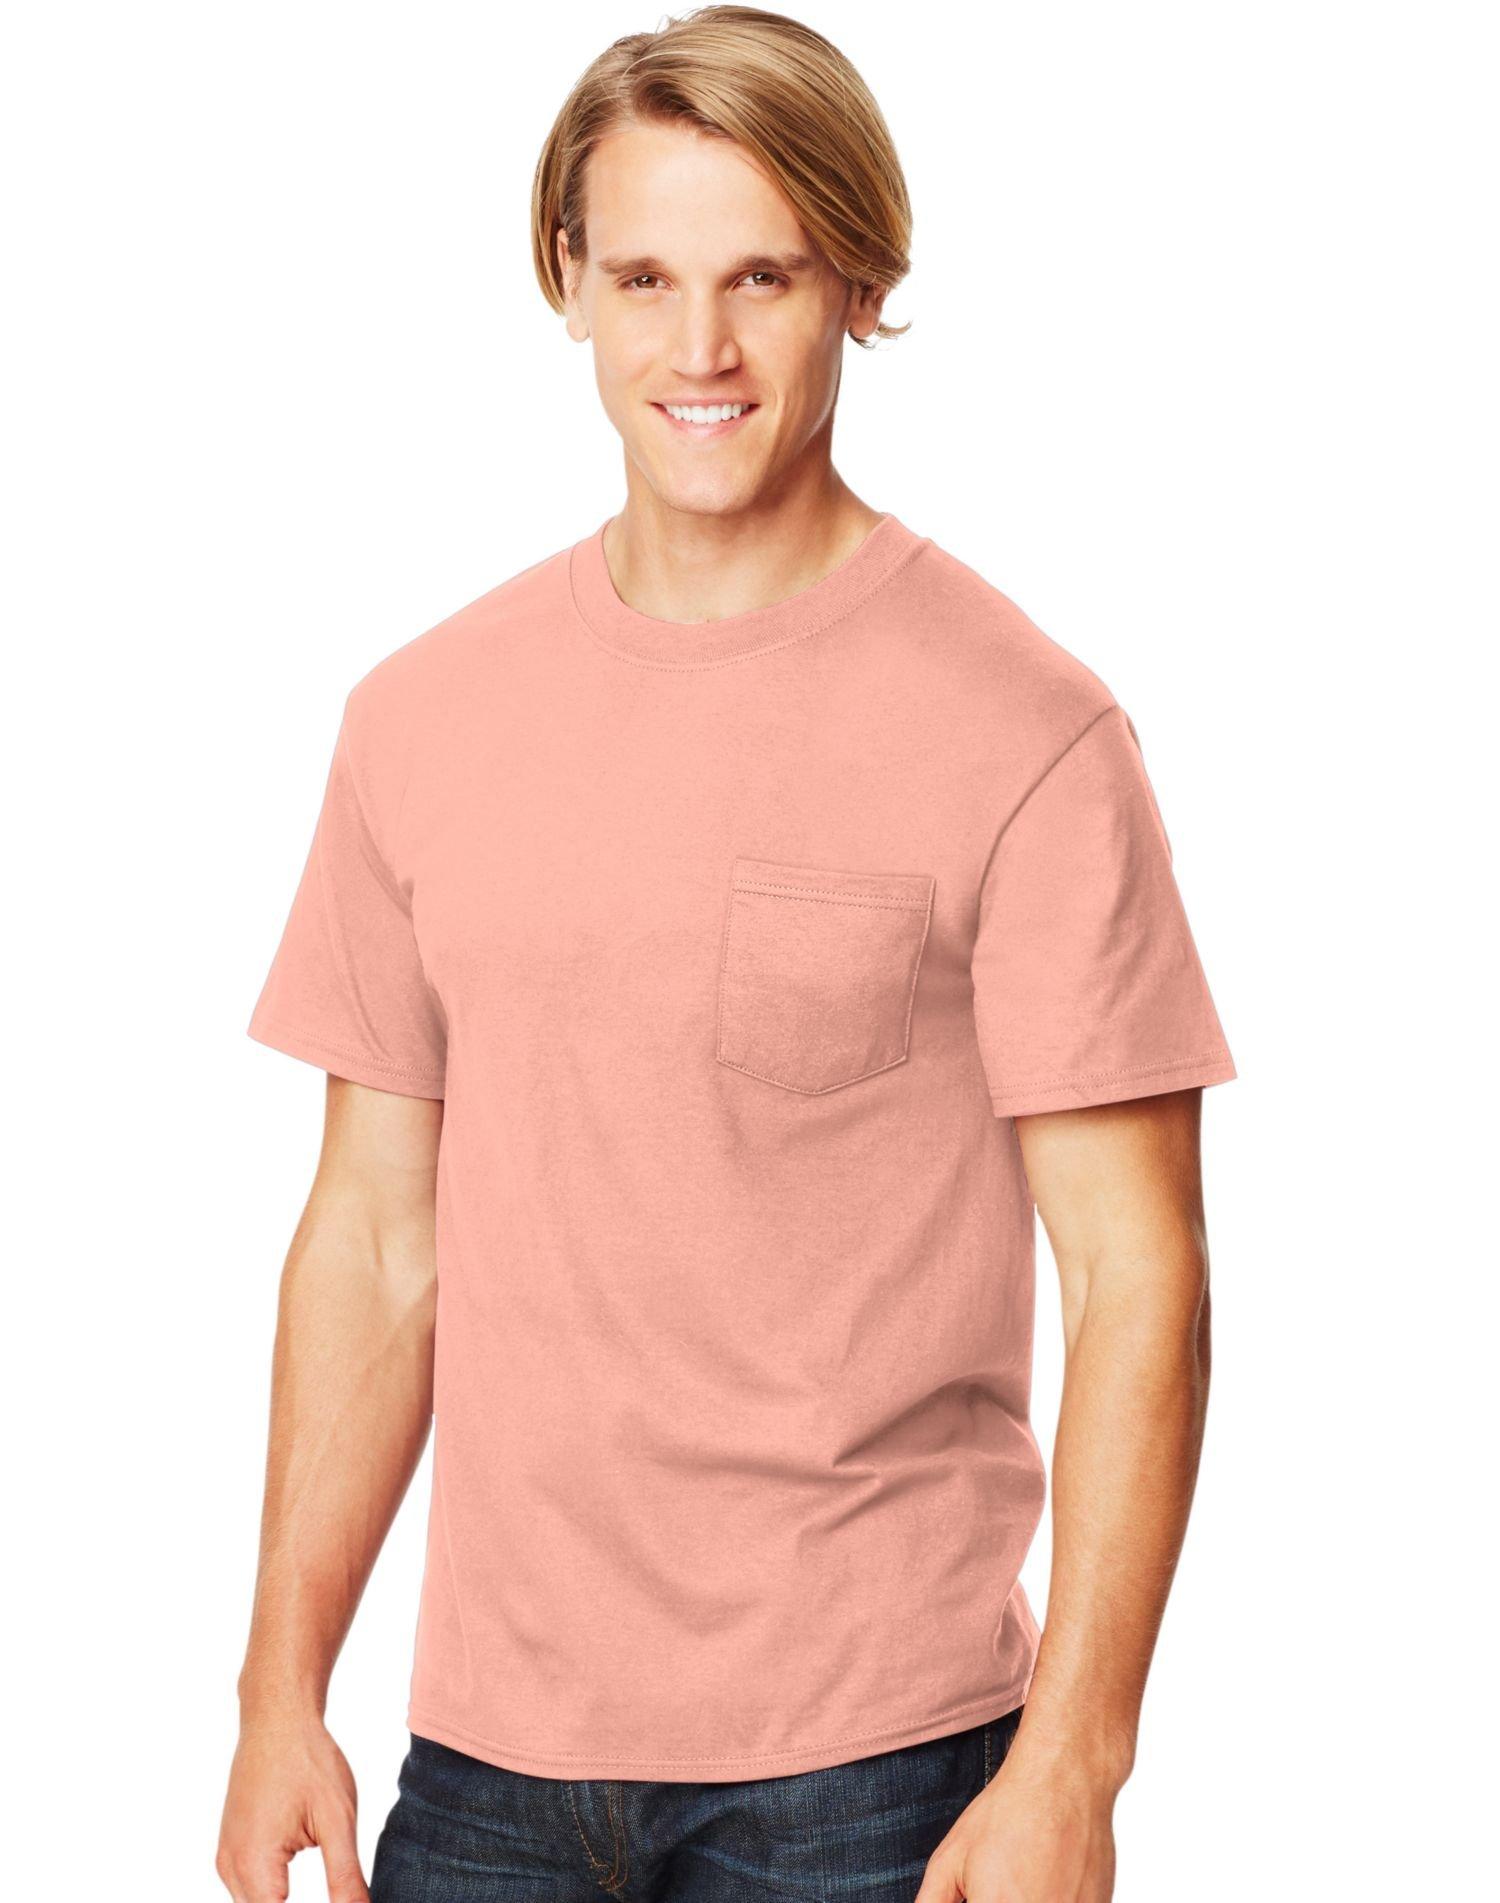 Hanes Beefy-T Adult Pocket T-Shirt, Candy Orange, M US (Chest 38-40)